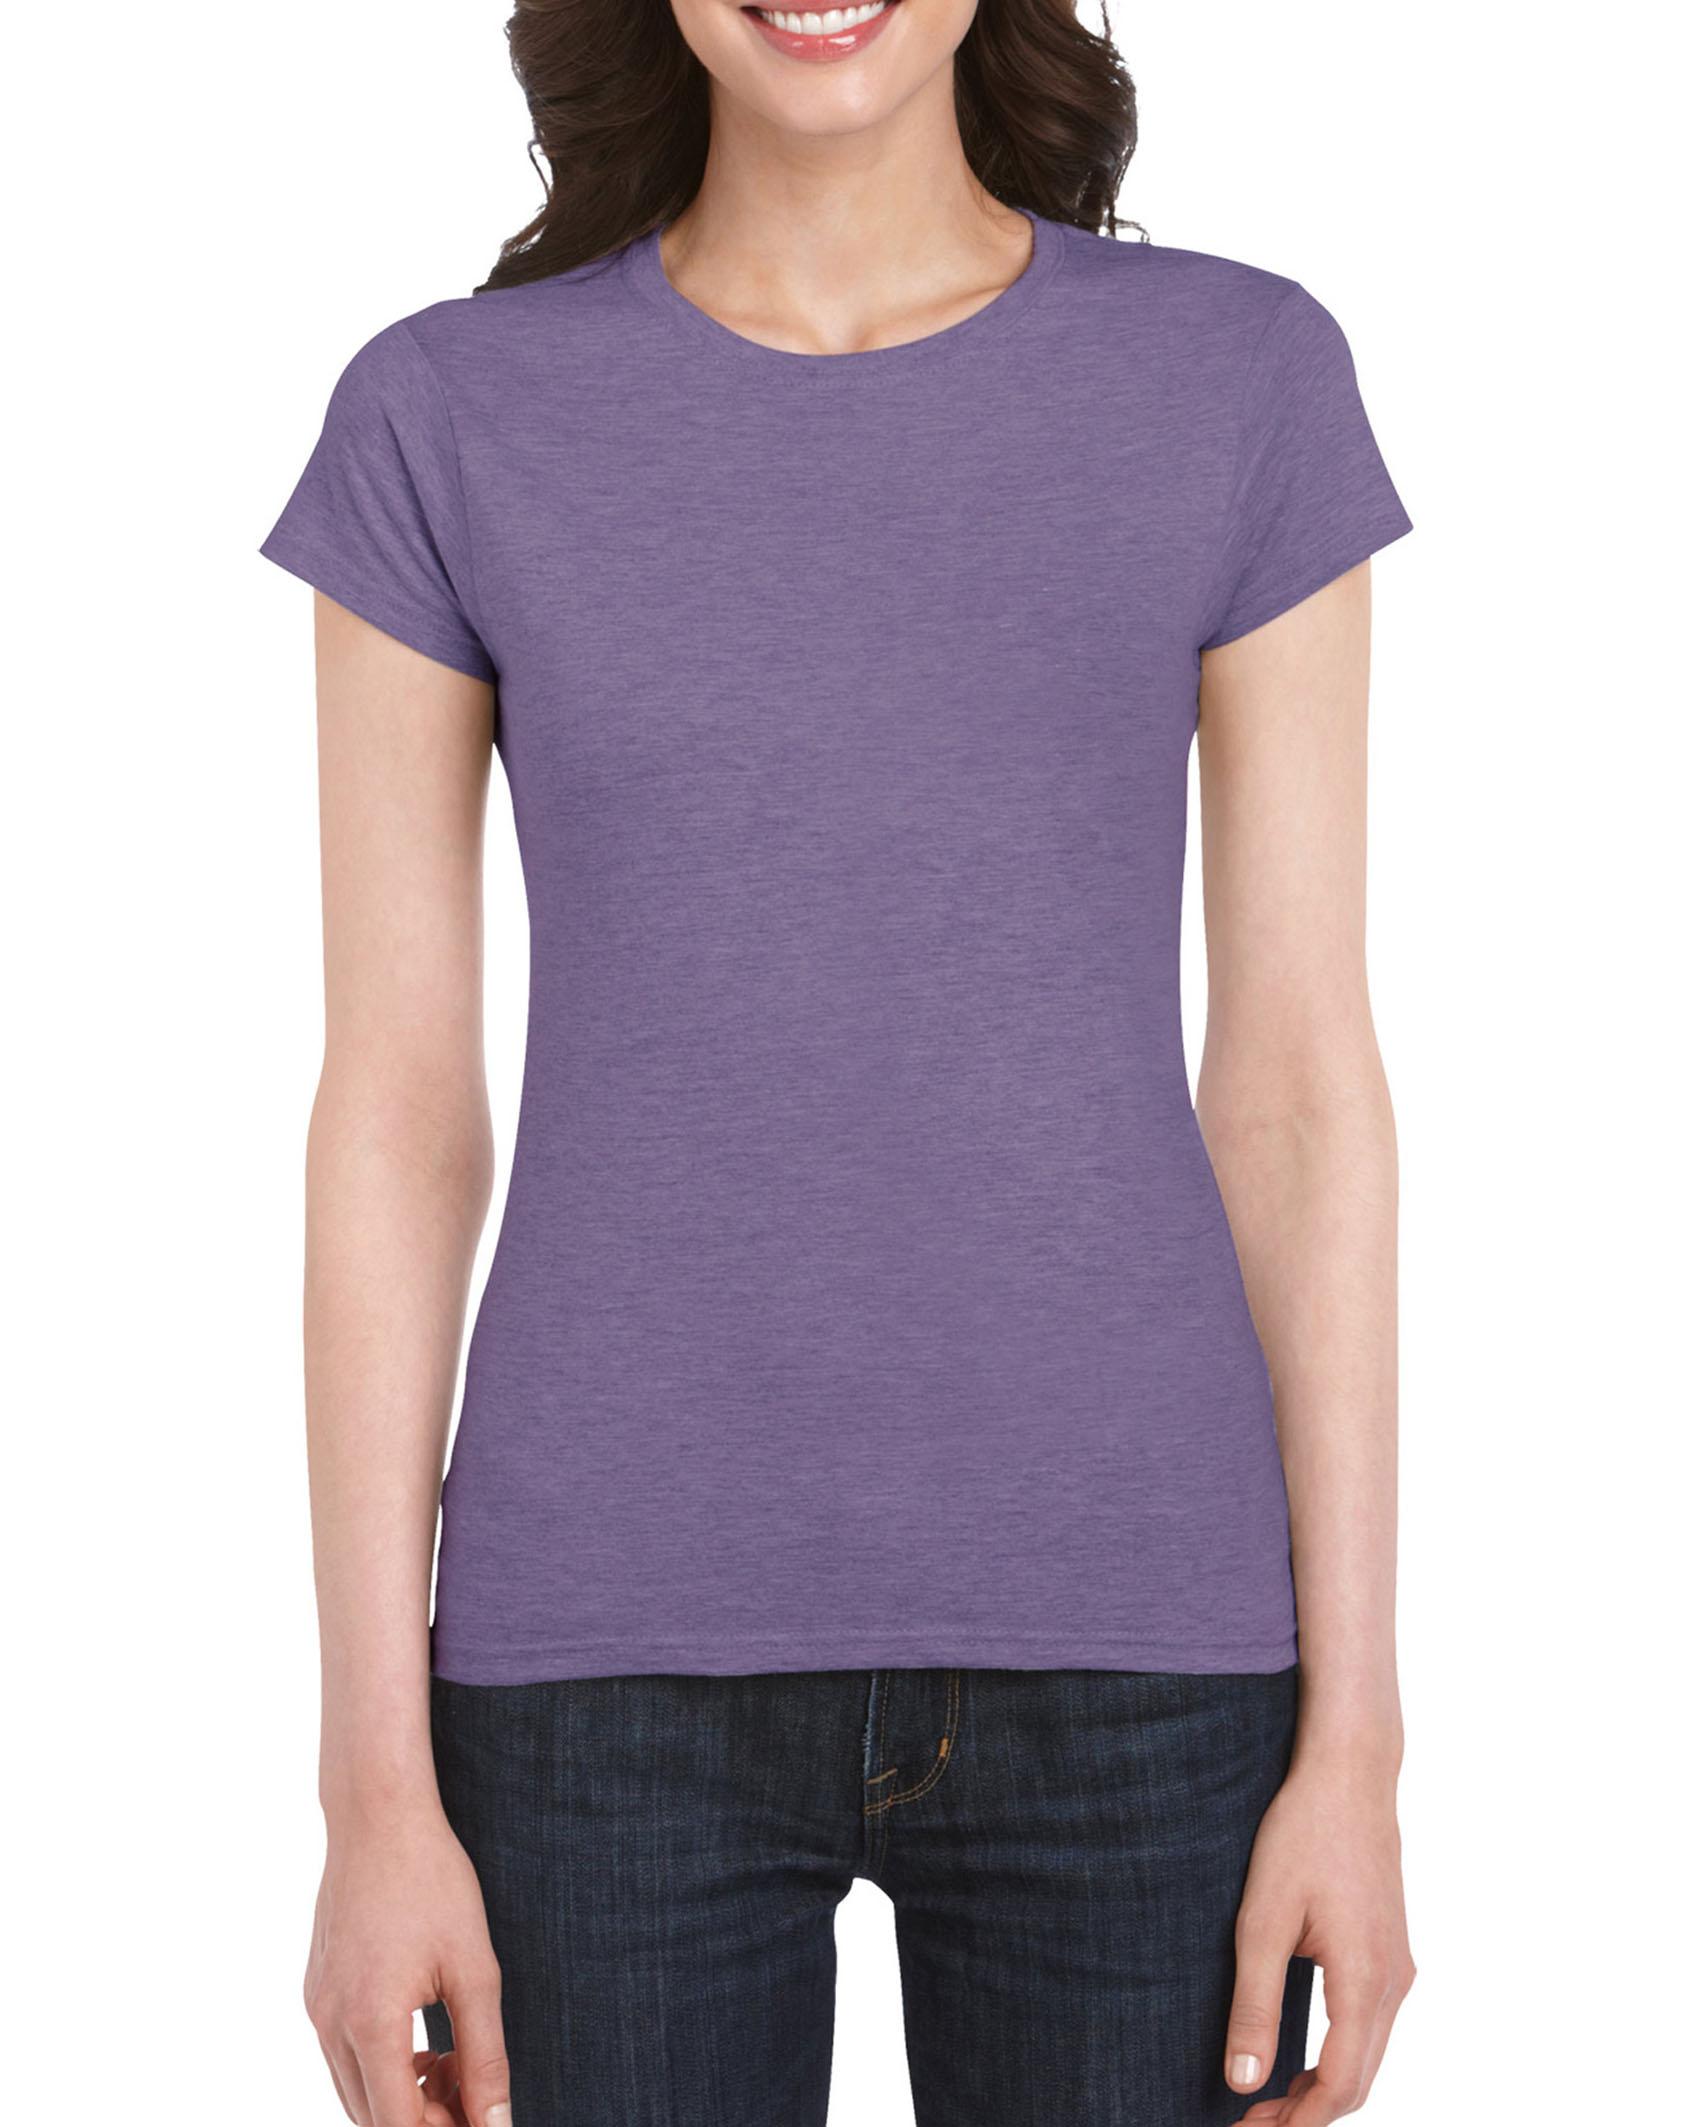 heather purple